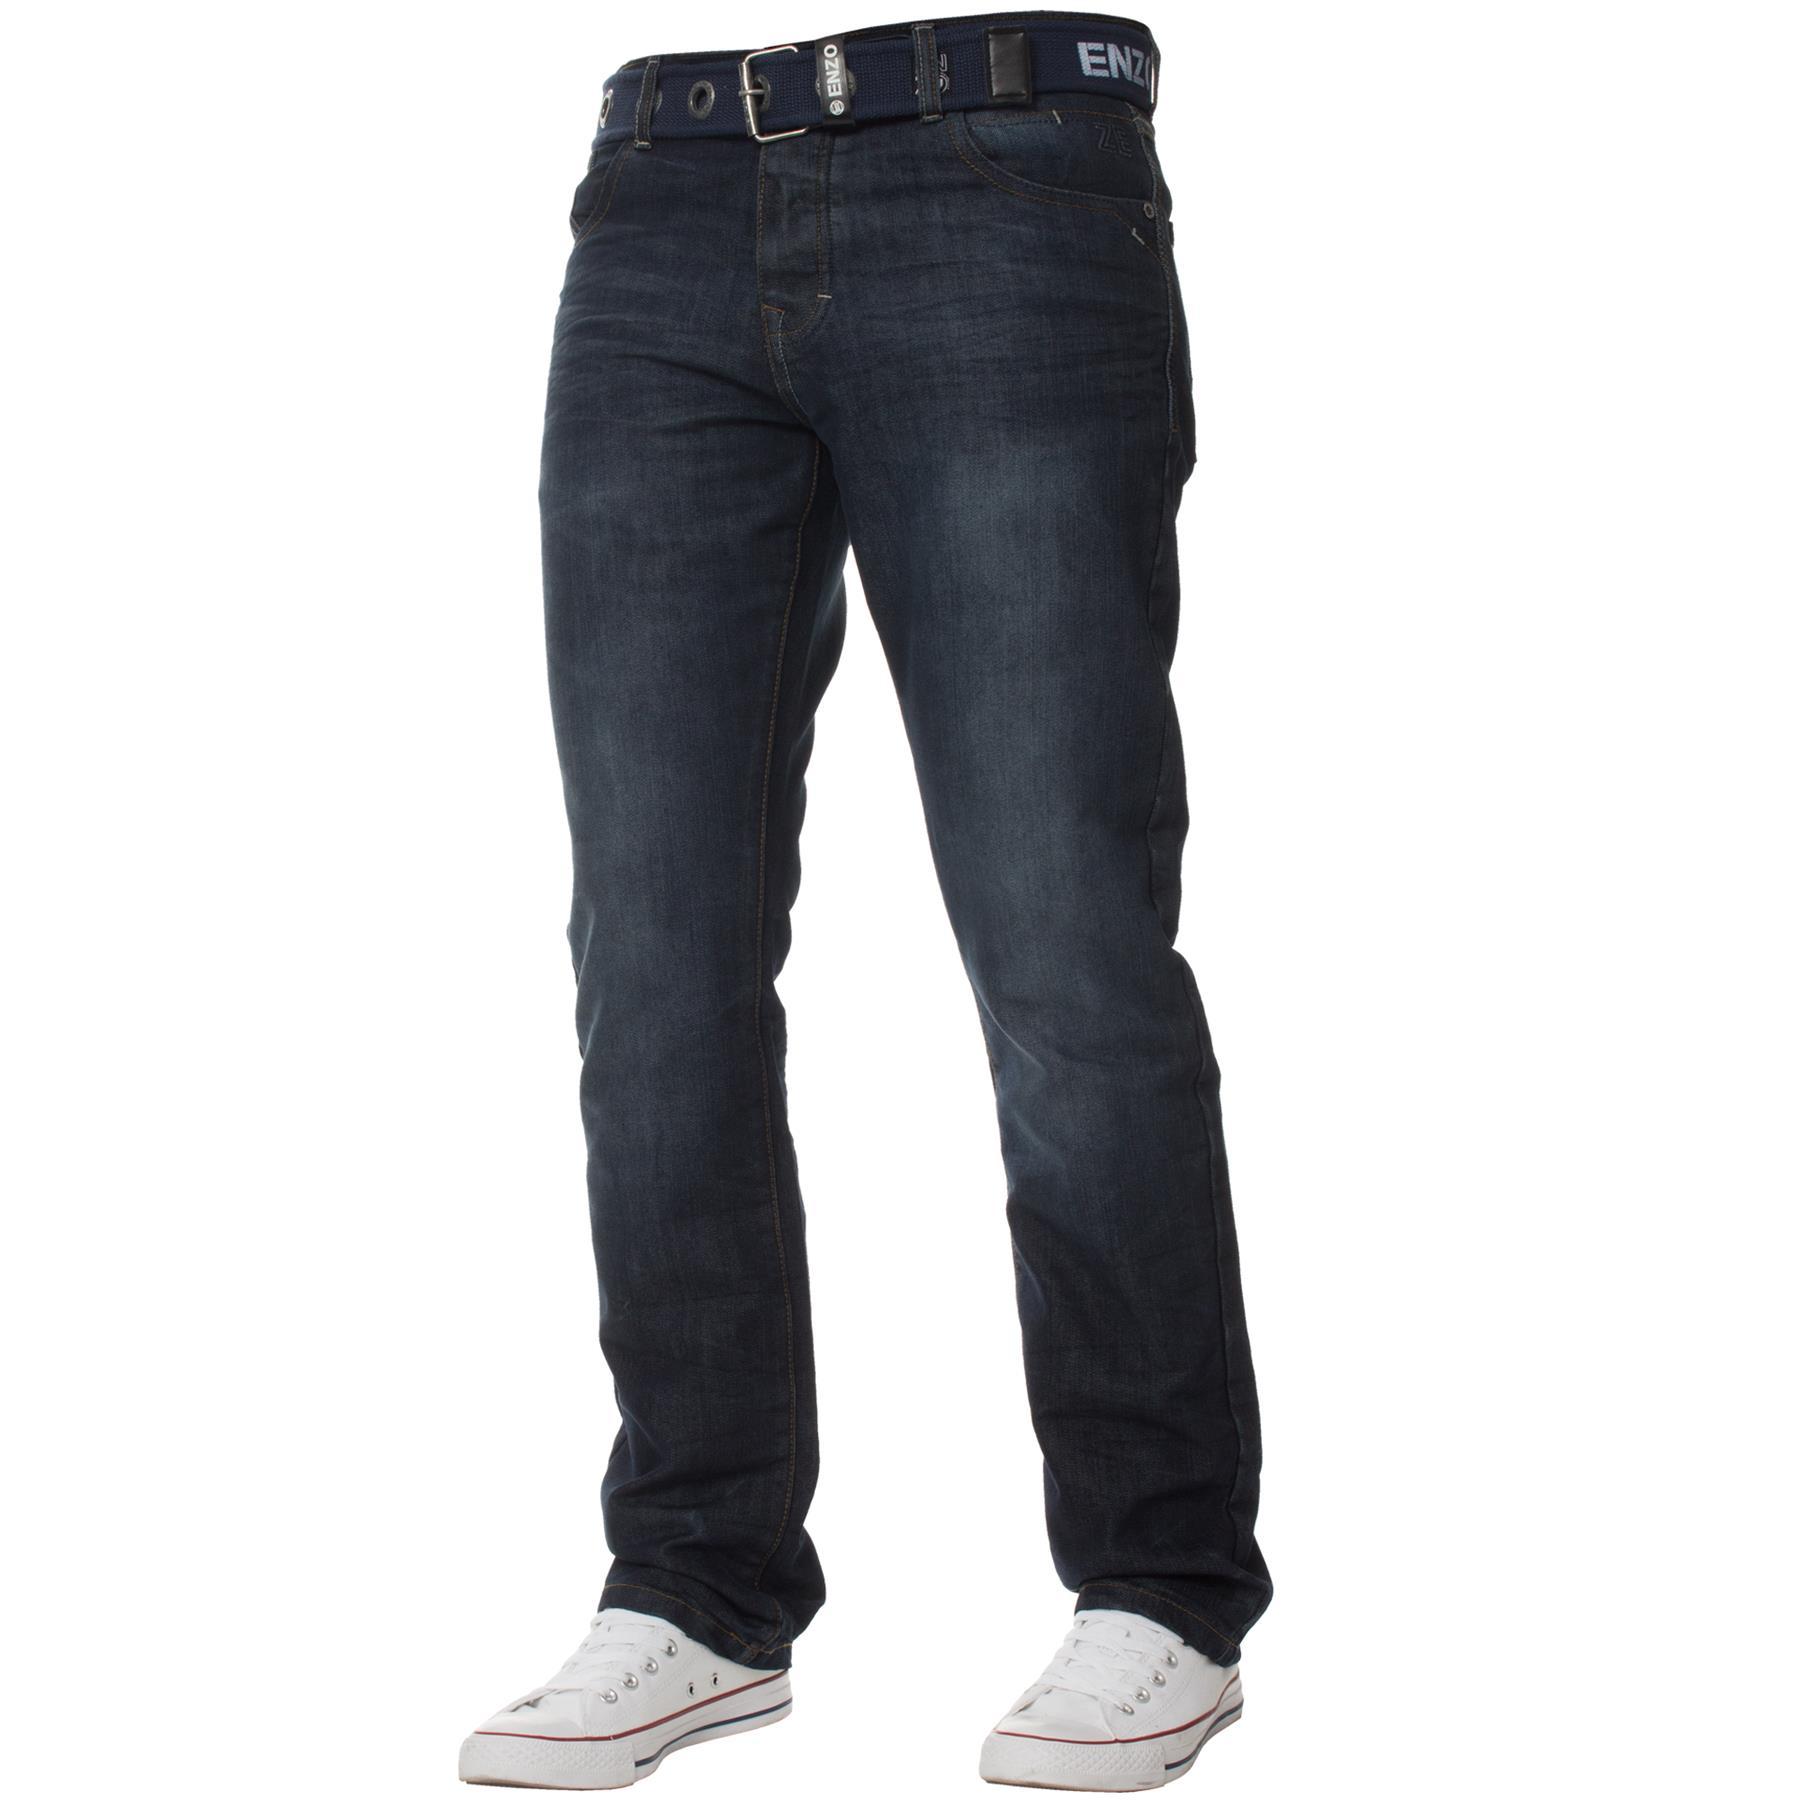 Enzo-Mens-Big-Tall-Jeans-Leg-King-Size-Denim-Pants-Chino-Trousers-Pants-44-034-60-034 thumbnail 80